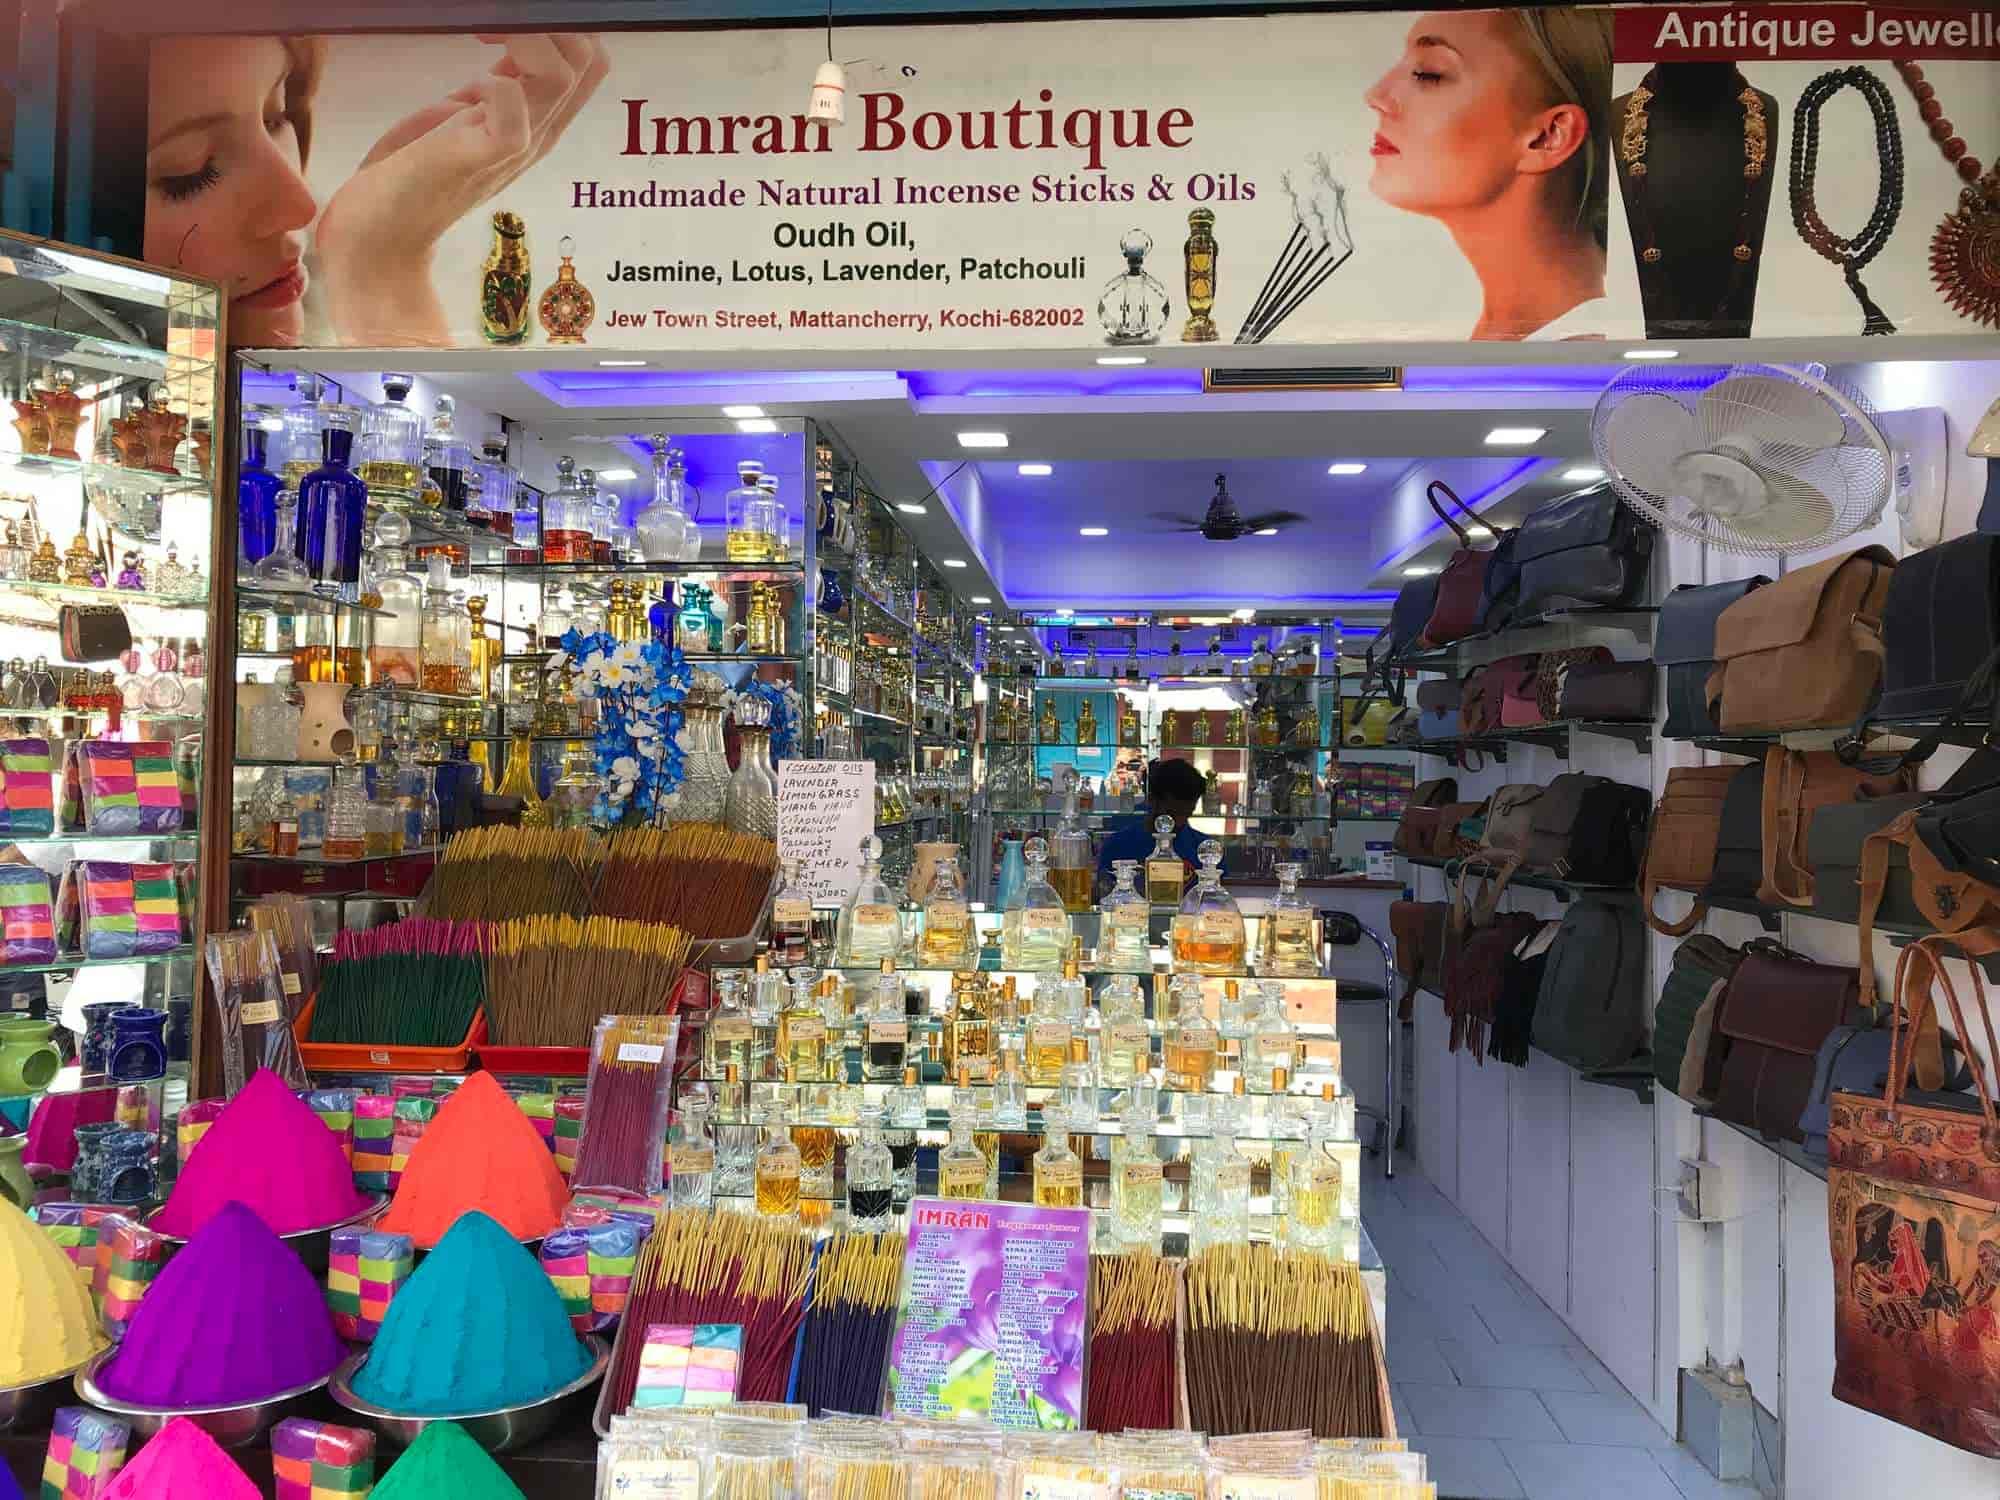 Imran Shop Hand Made Natural Incense & Perfume Oils, Mattancherry